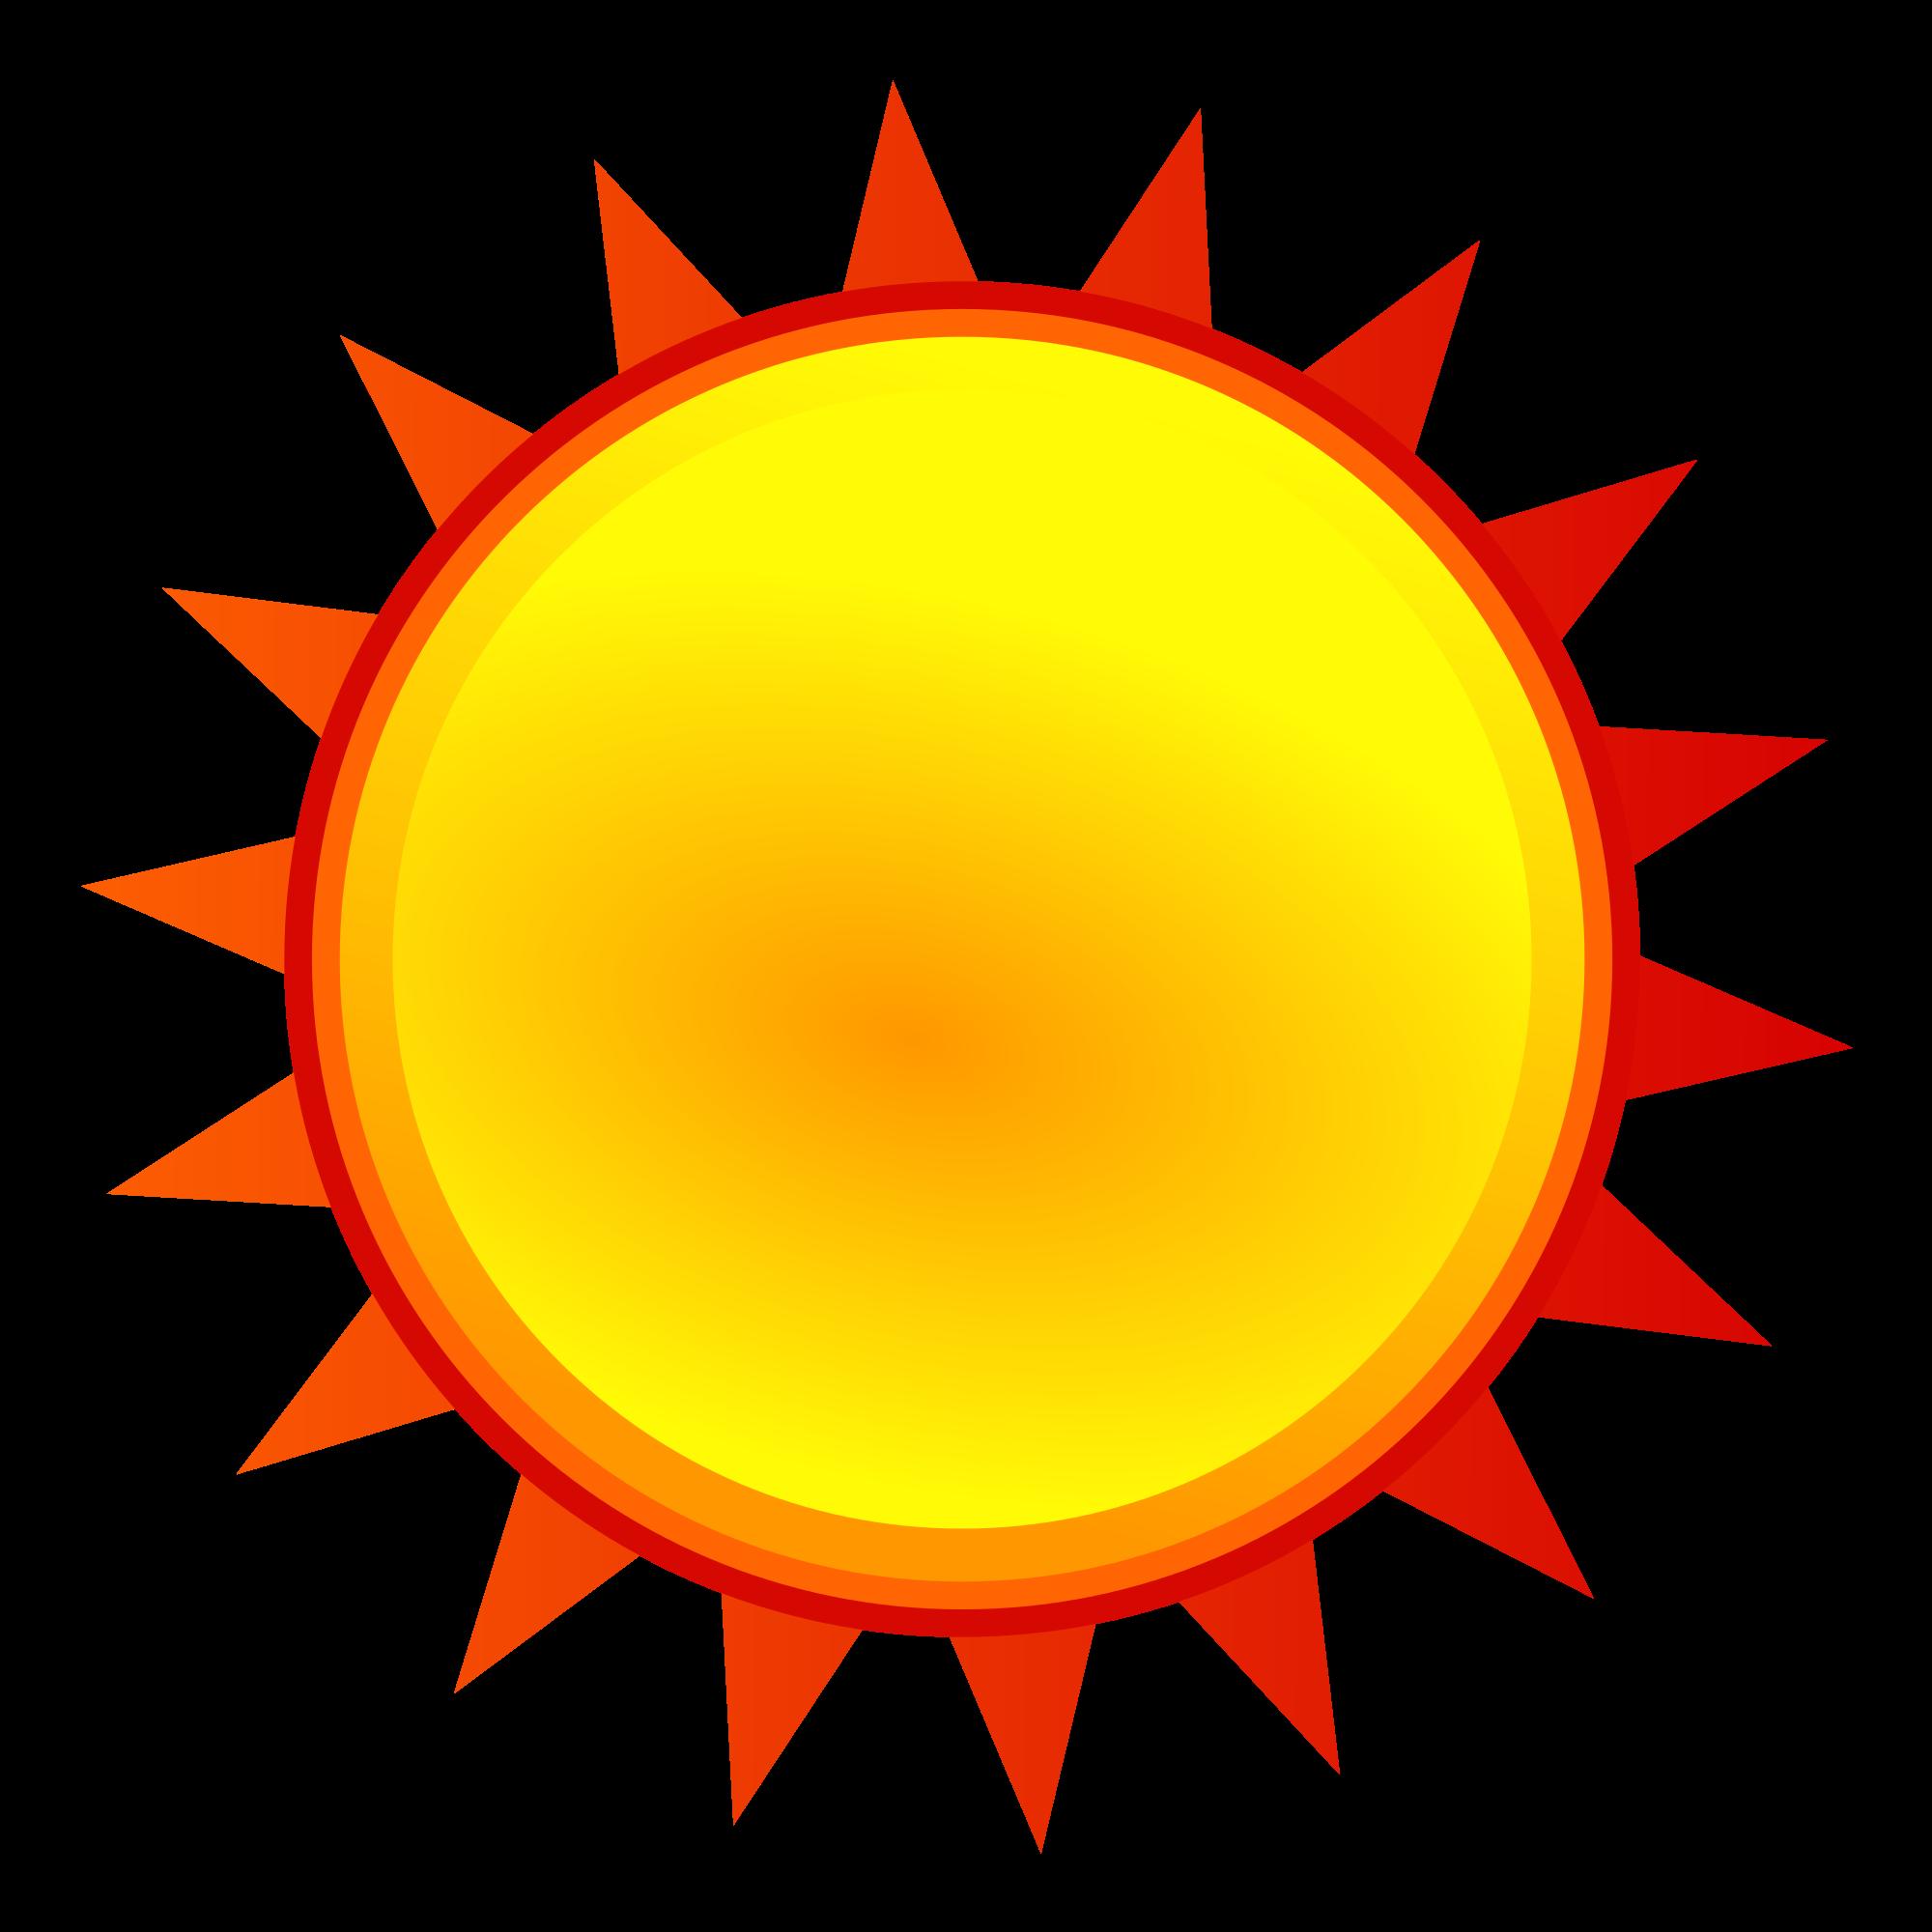 2000x2000 Filenuvola Weather Sunny.svg